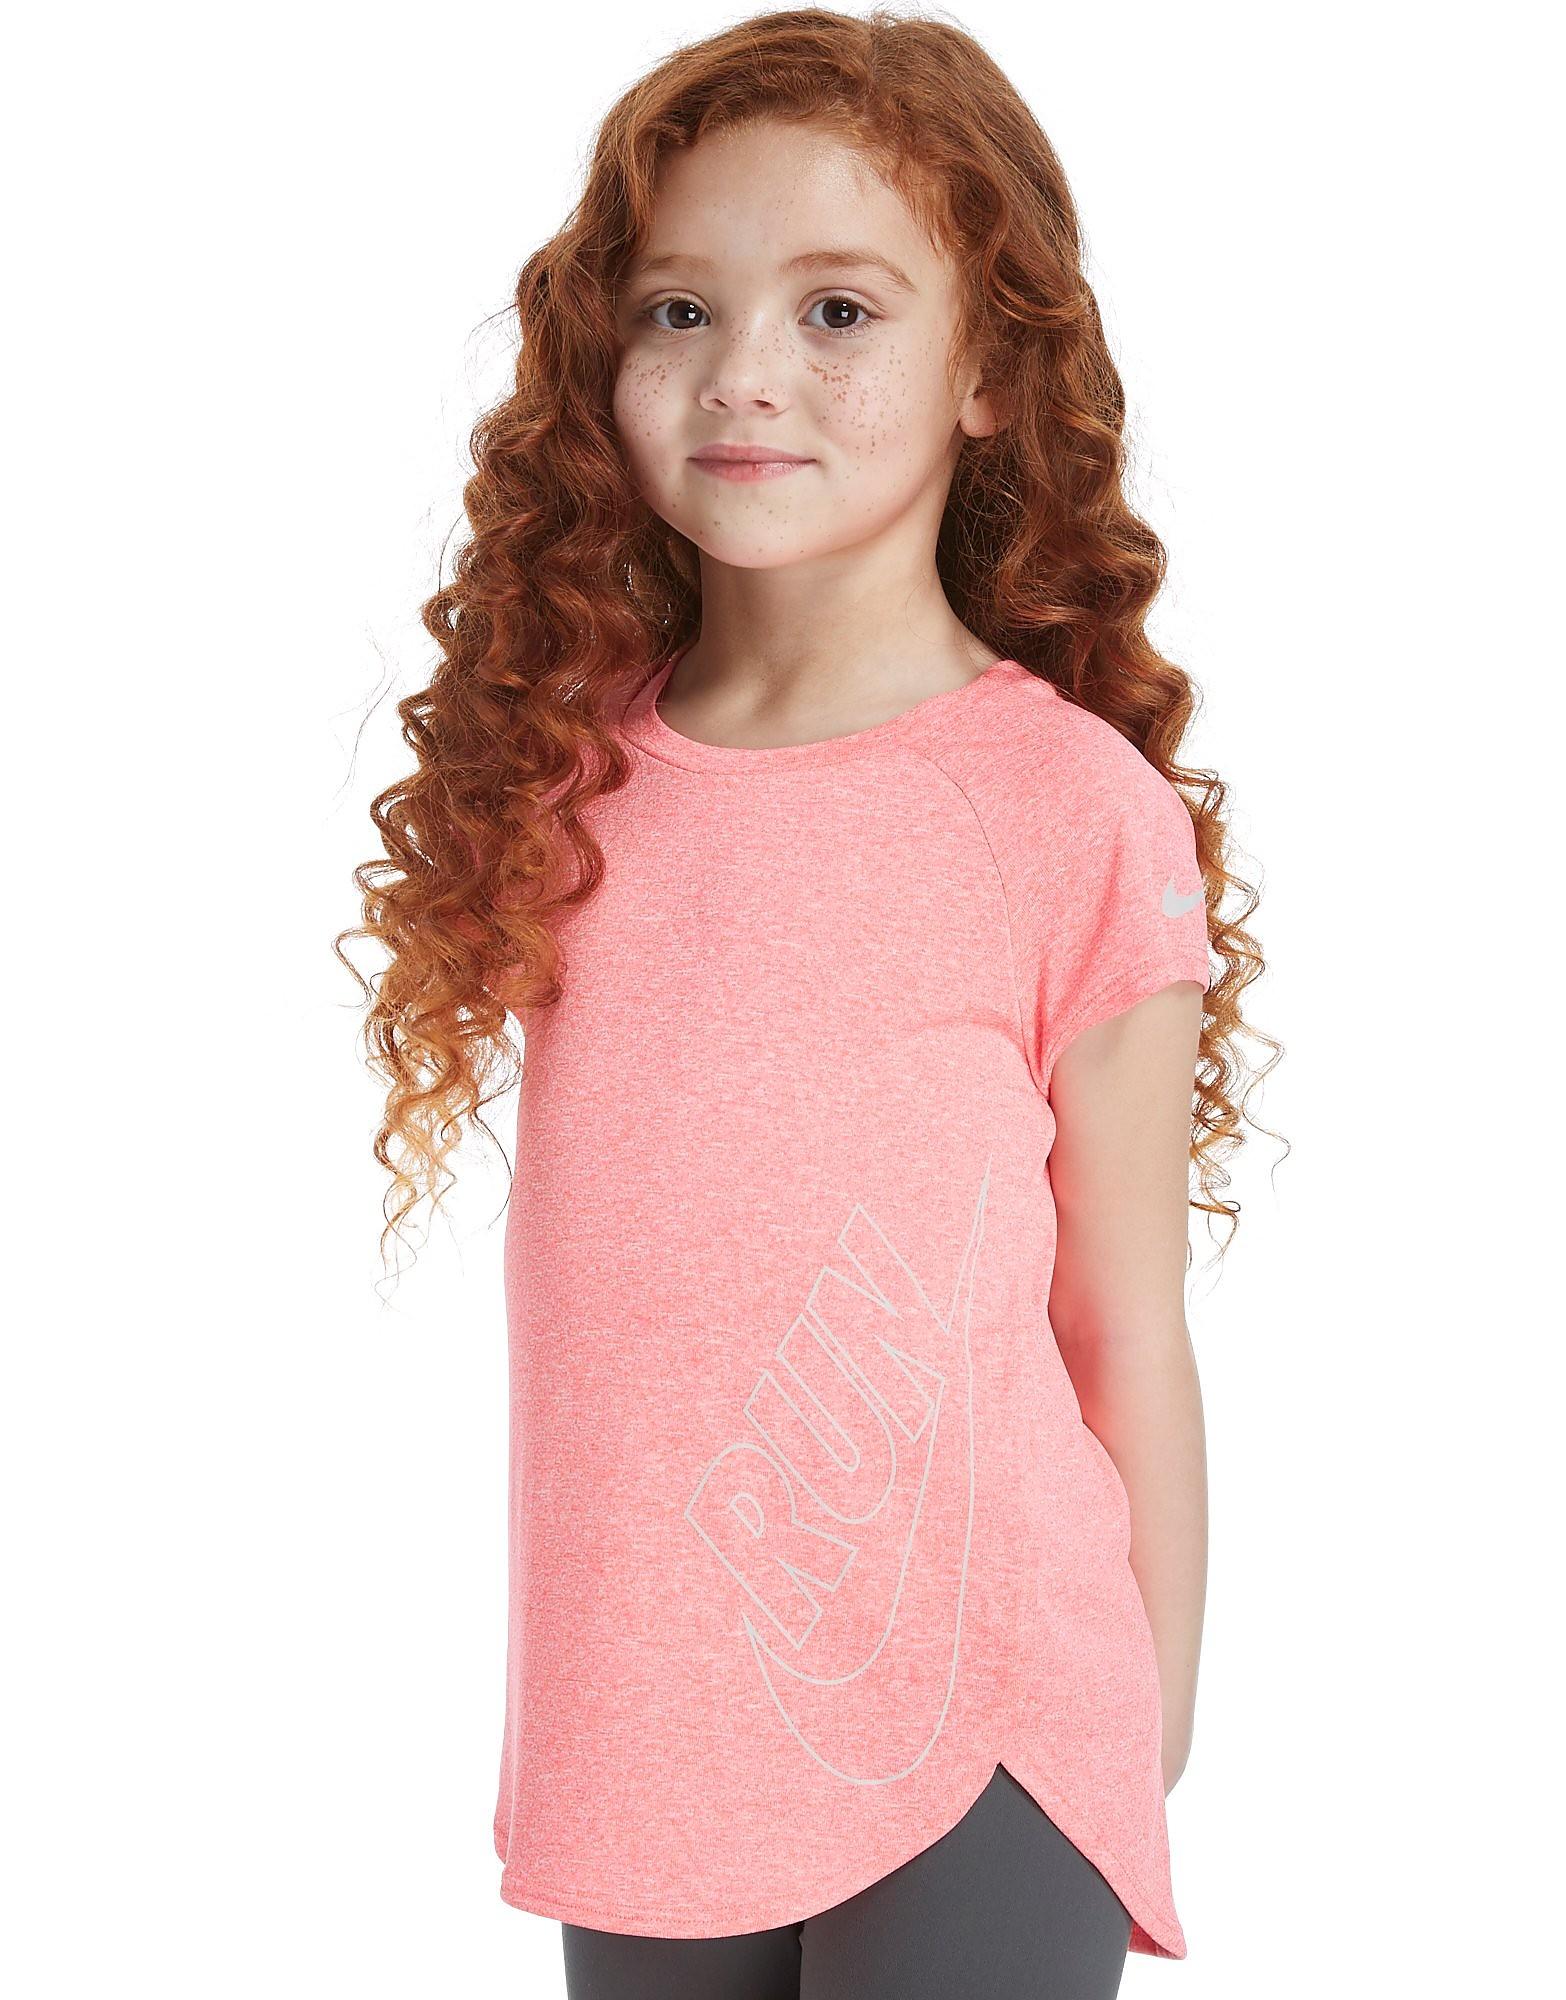 Nike Girls' Short Sleeve Top Kinderen - Roze - Kind